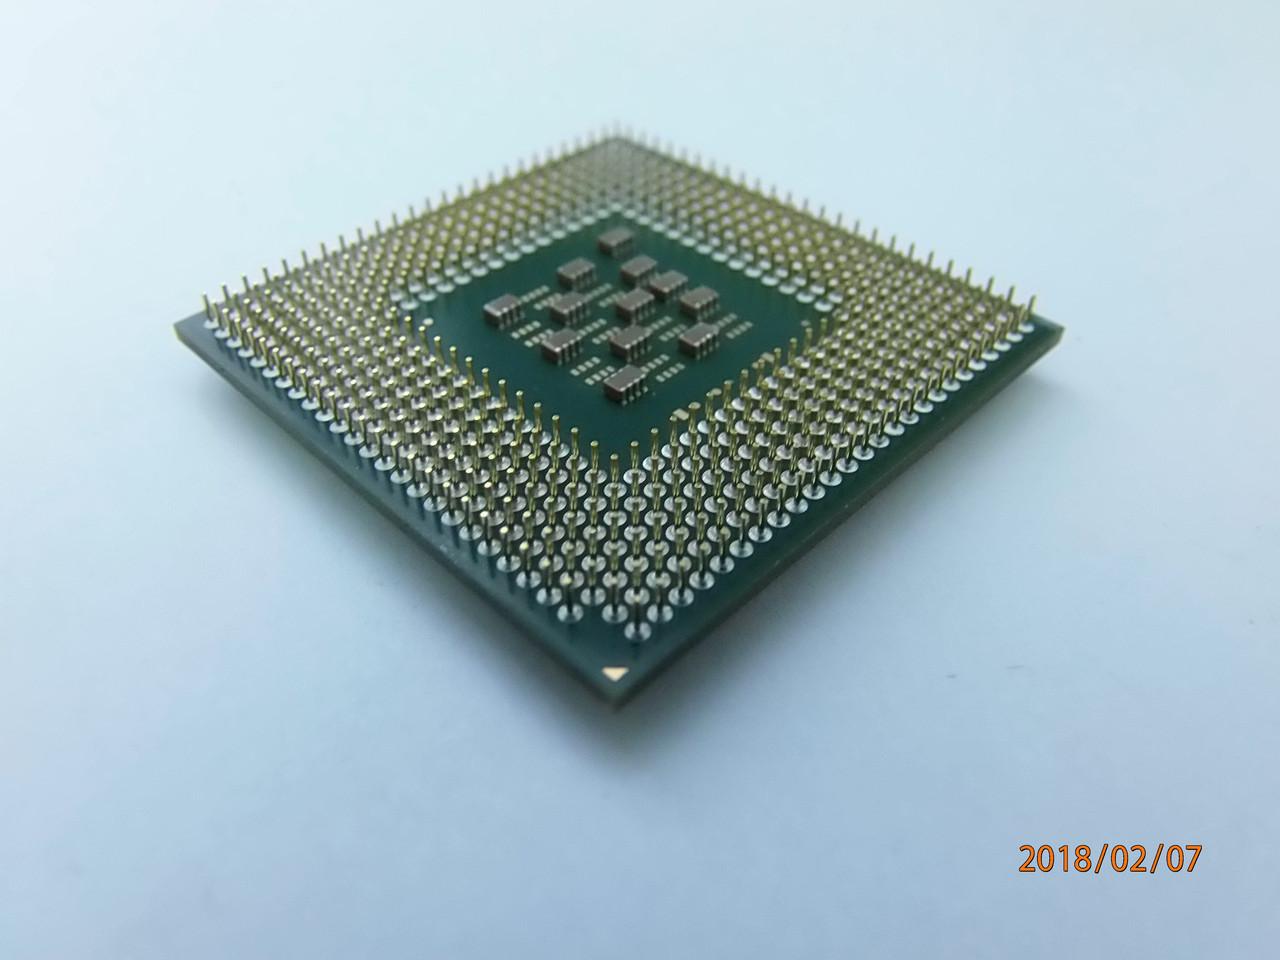 Процесор Intel Celeron 2,0 Ghz/128/400/1.315 V-1.525 V SL6SW